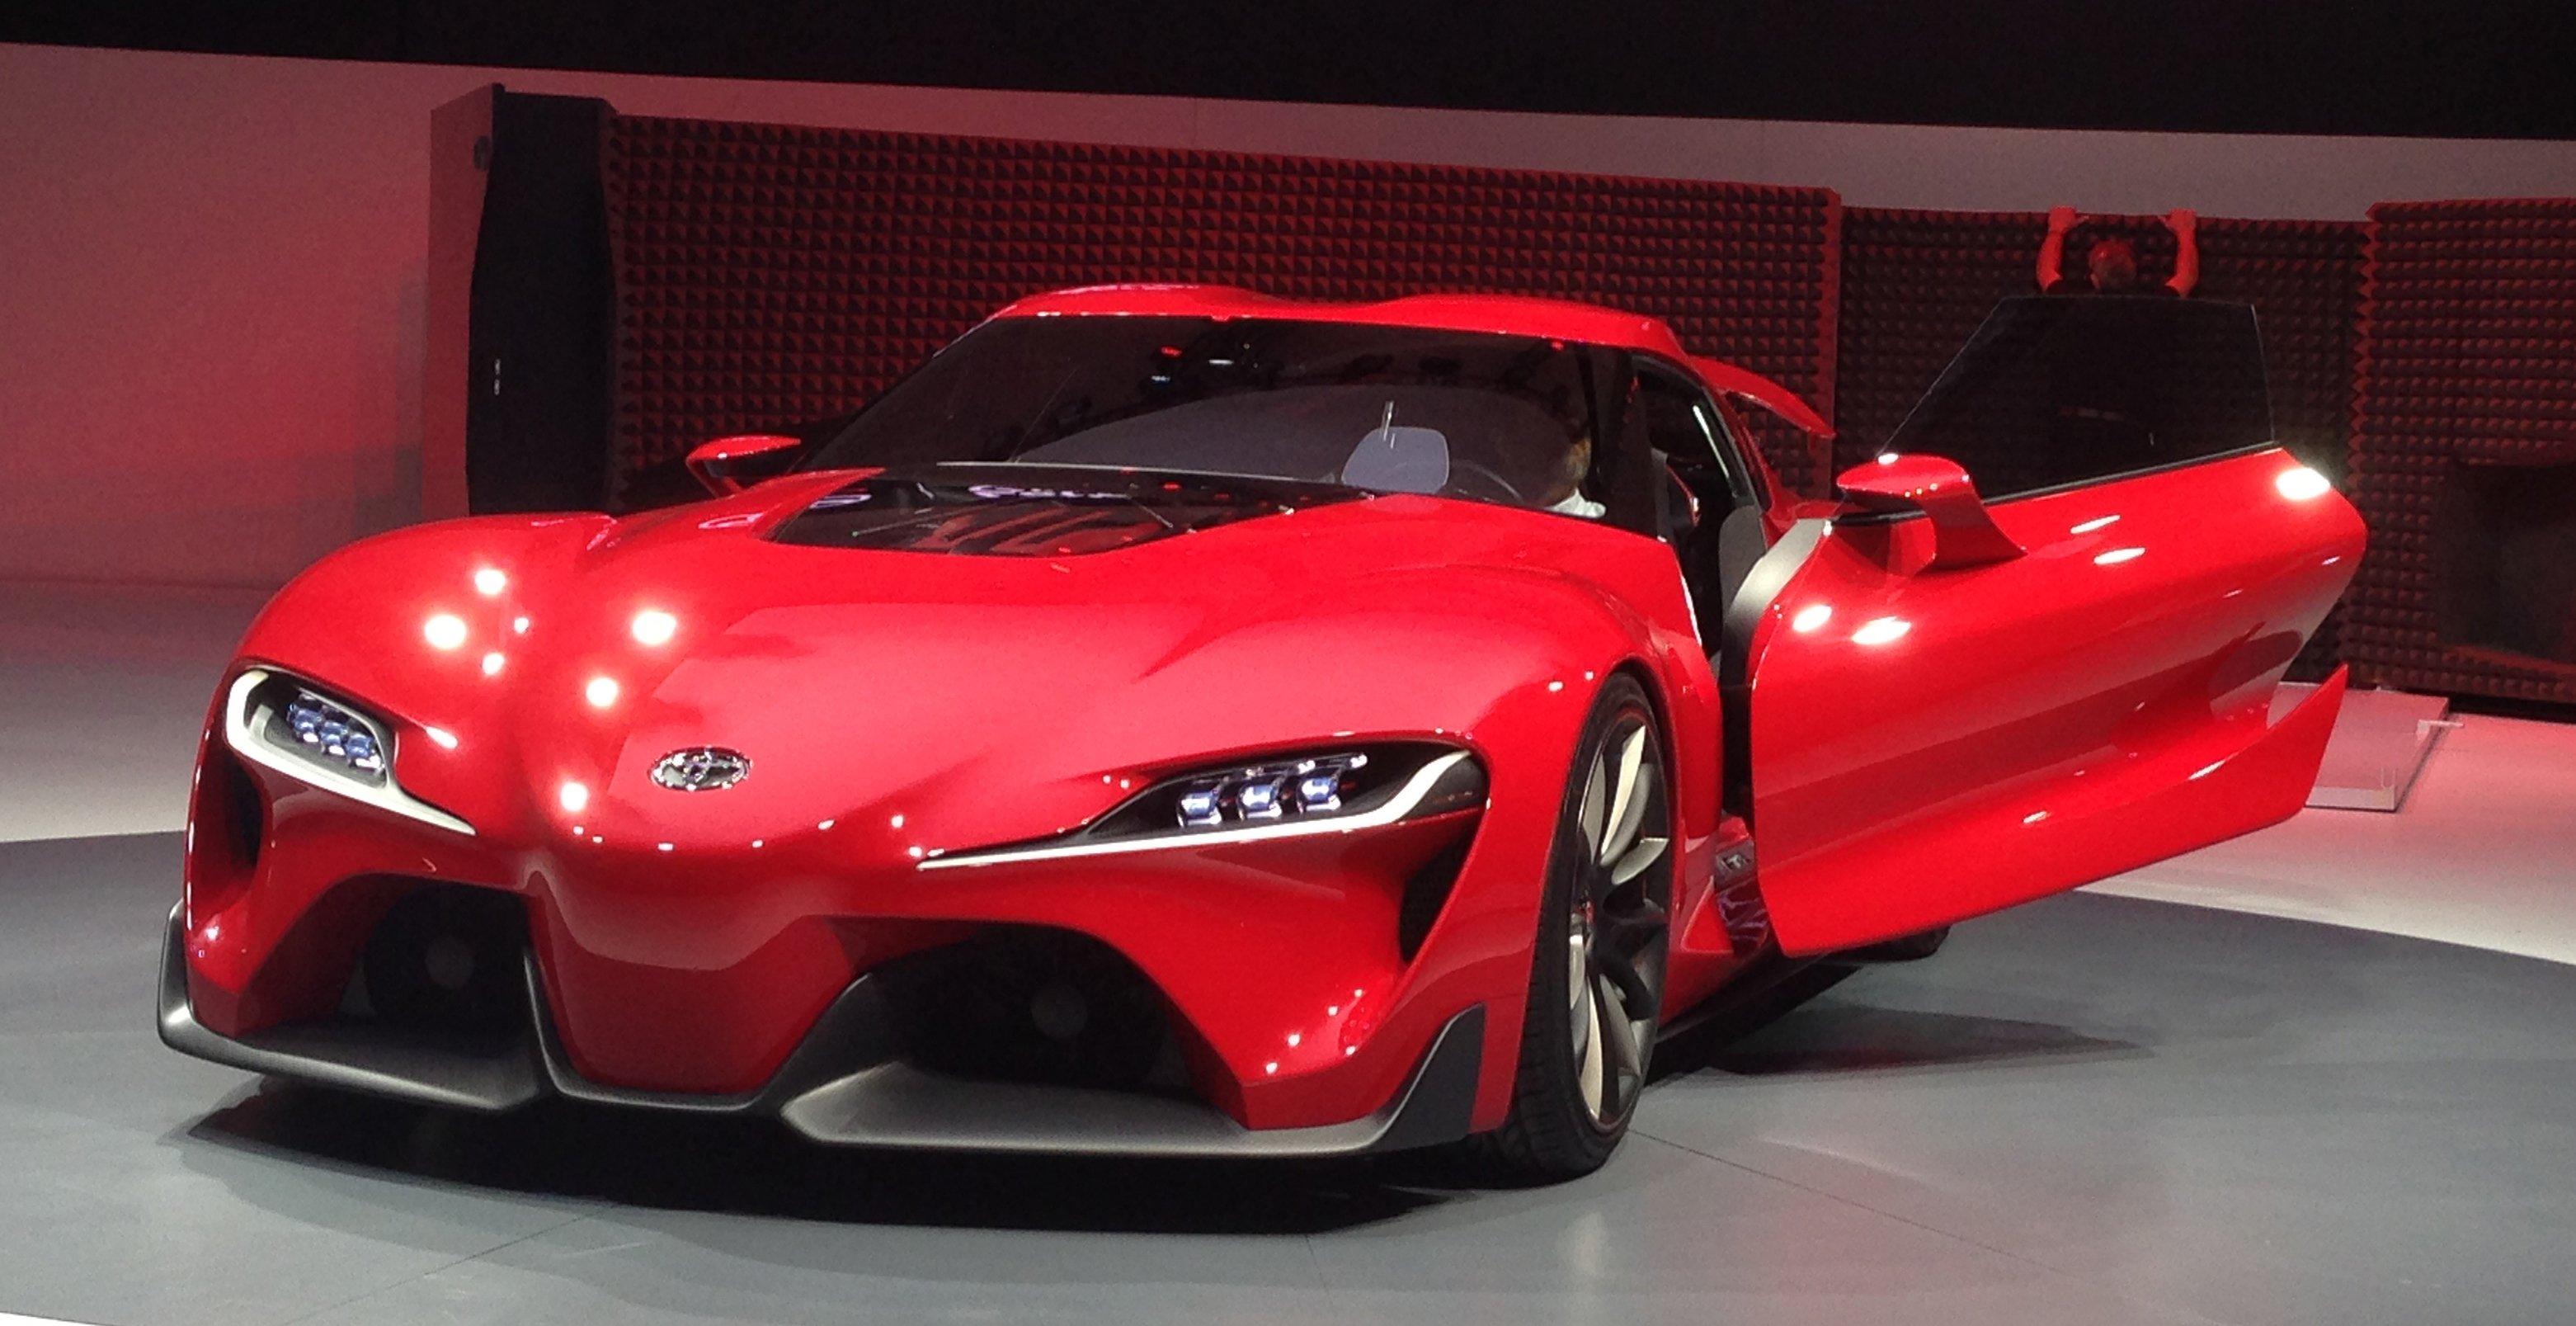 Toyota Supra 2016 >> Toyota FT-1 concept shocks Detroit – the next Supra? Image 221944